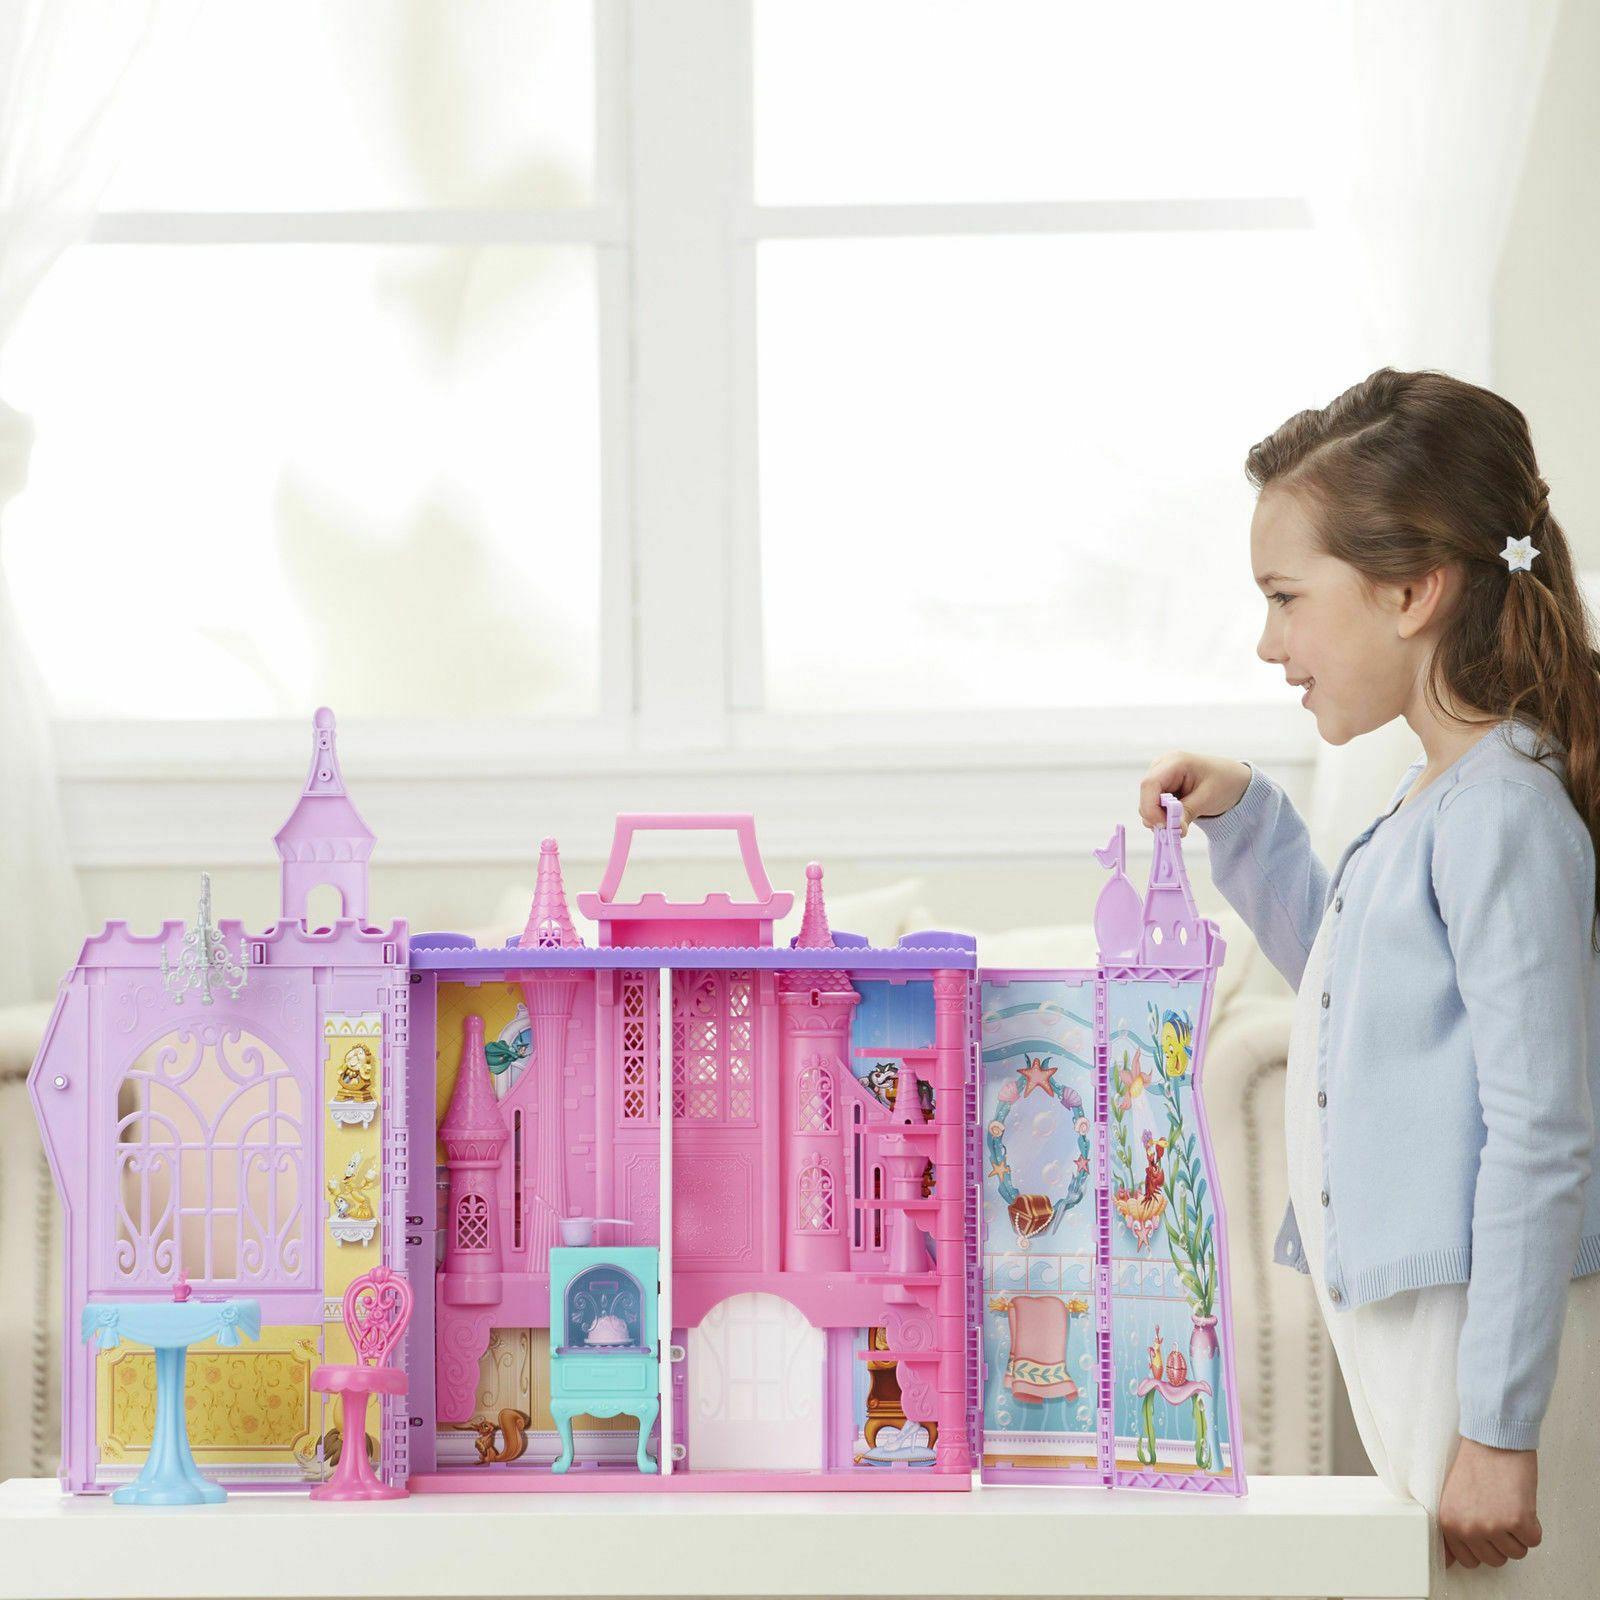 Huge Disney Princess Pop Up Palace Castle Dollhouse Playset Kid Toy Gift 59 99 Disne Disney Princess Palace Pets First Disney Princess Disney Princess Castle